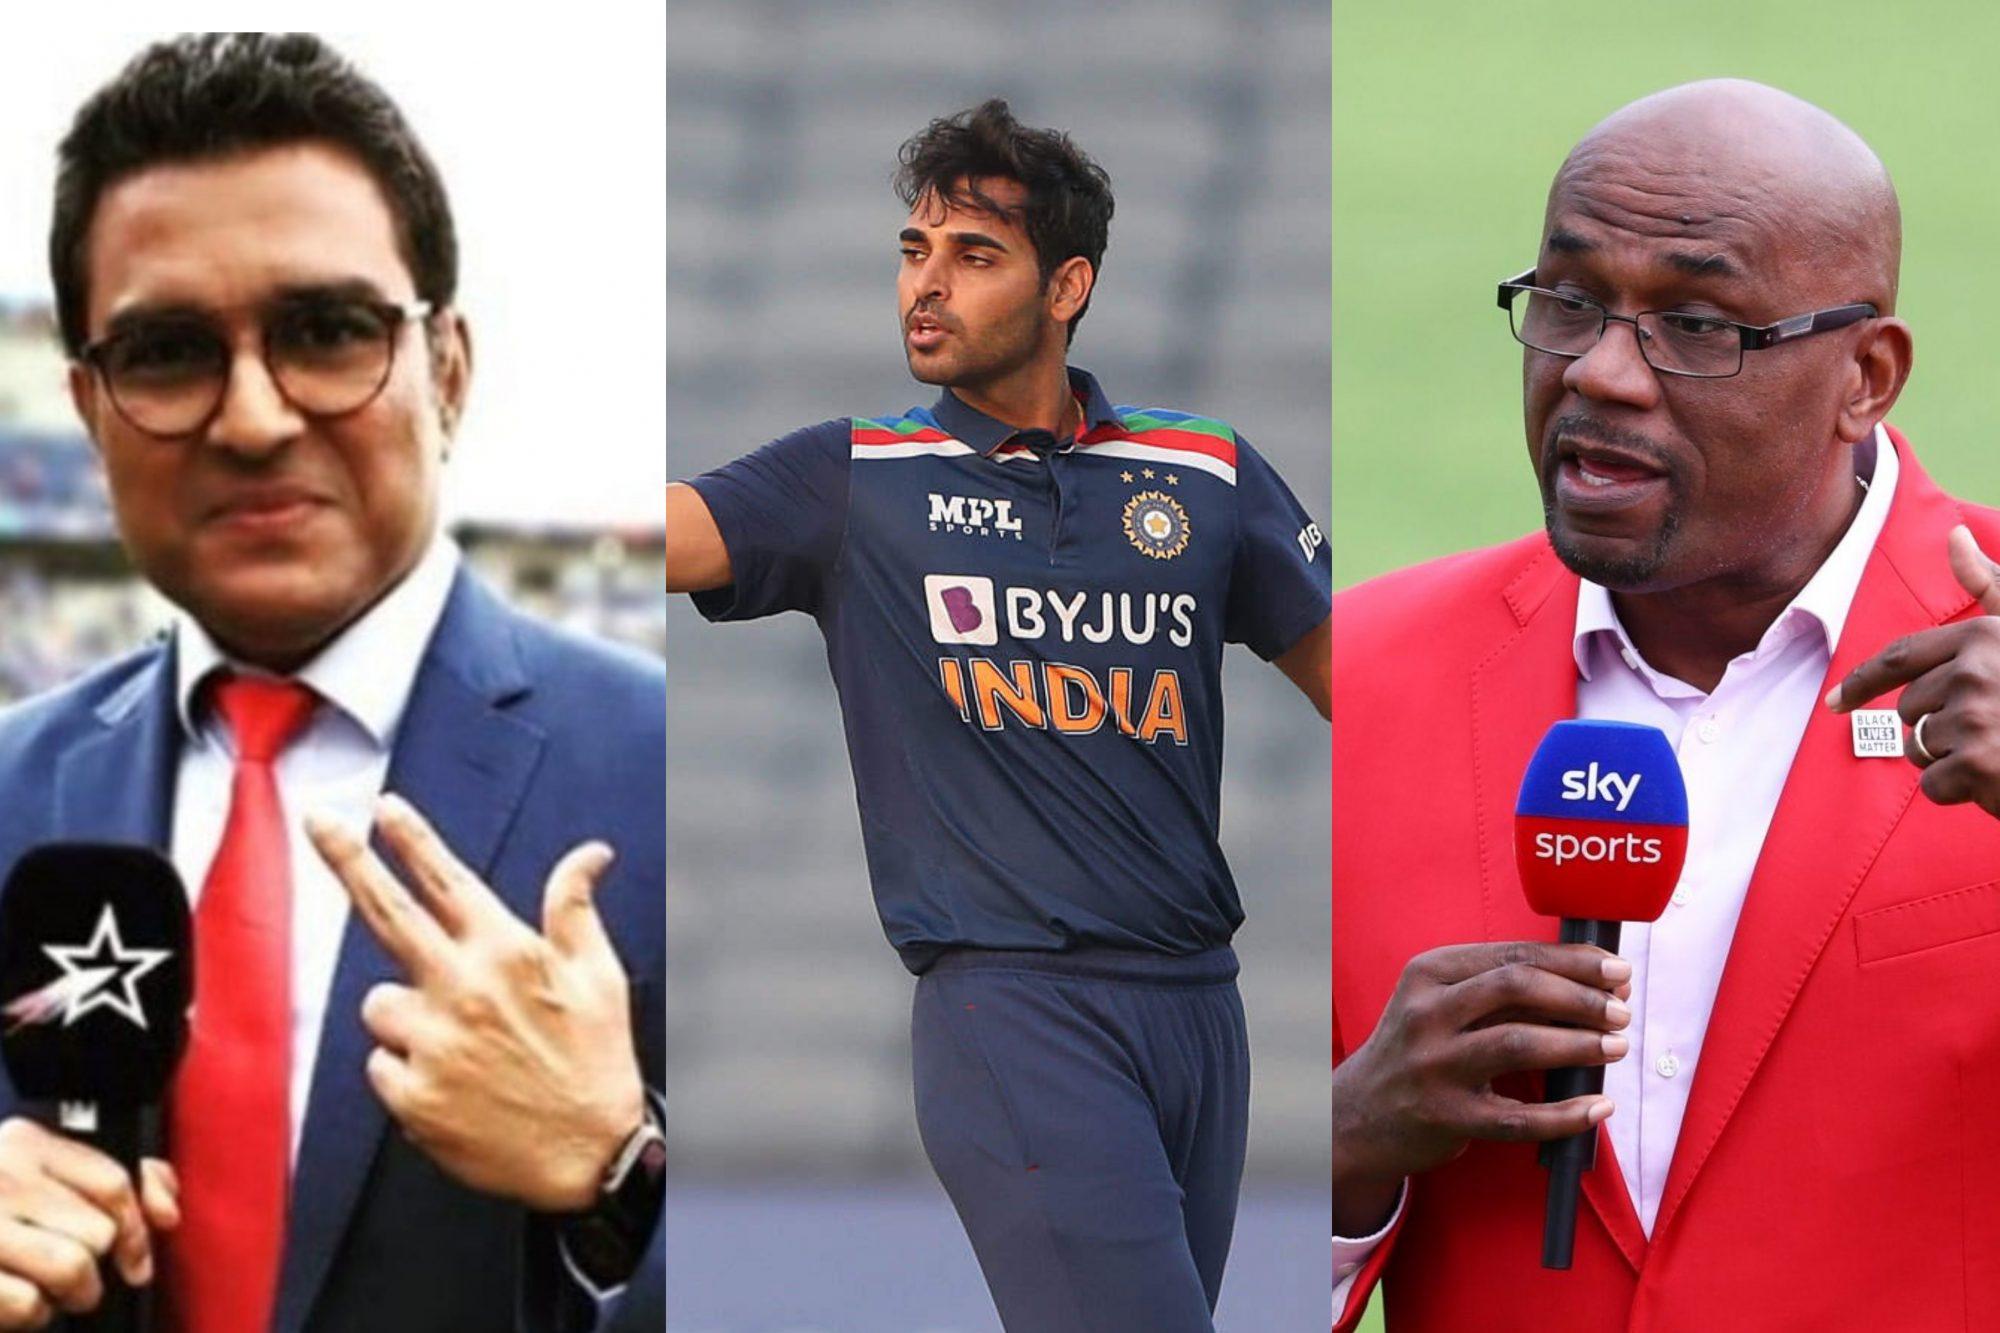 Deepak Chahar or Bhuvaneshwar Kumar - Ian Bishop & Sanjay Manjrekar Picks Deserving Choice For the T20 World Cup